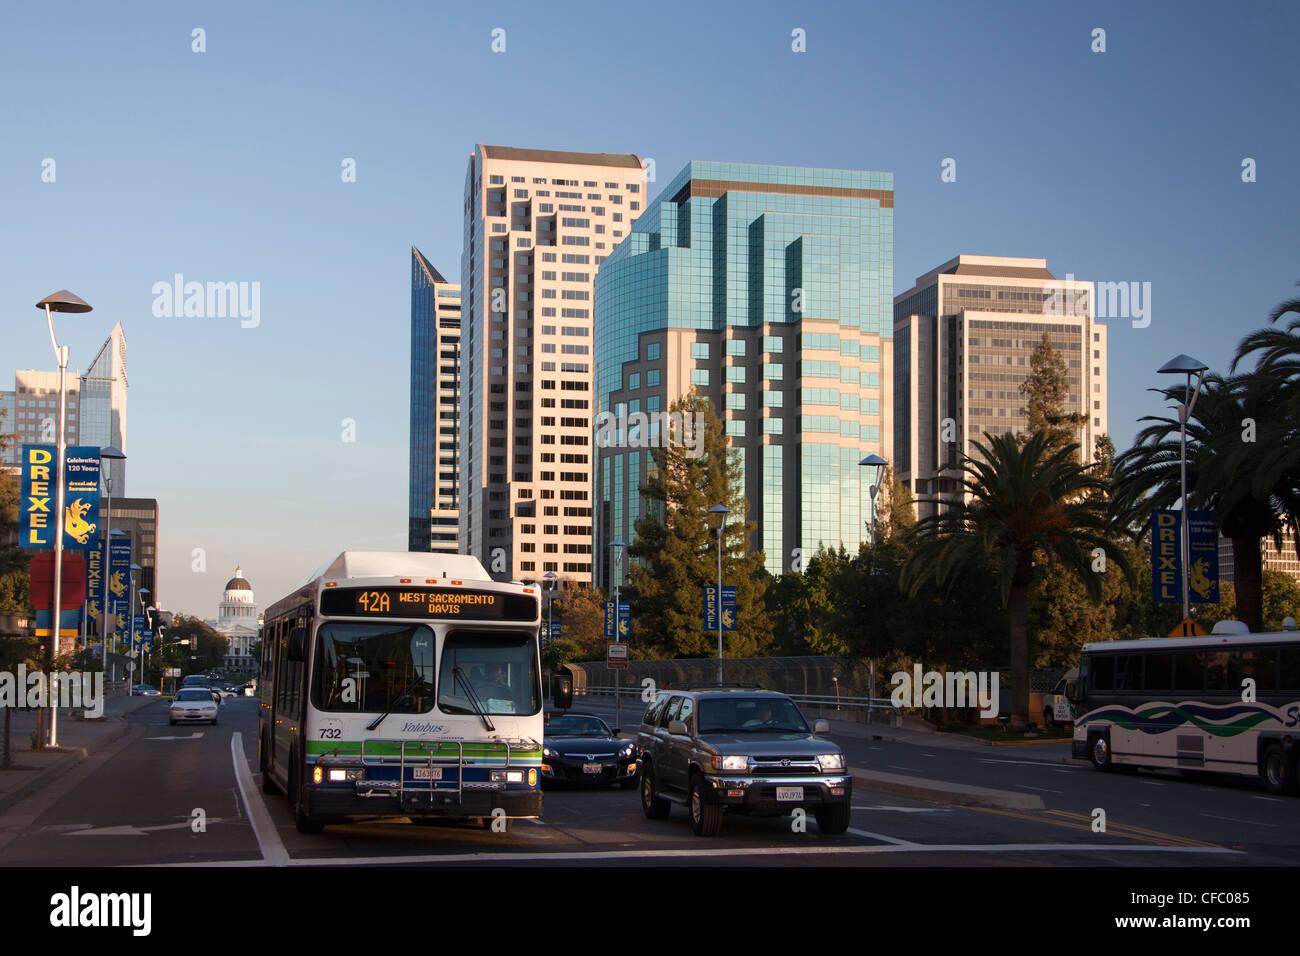 Stati Uniti d'America, Stati Uniti, America, California, Sacramento, Città, Capitol Mall, bus, Capitol Immagini Stock